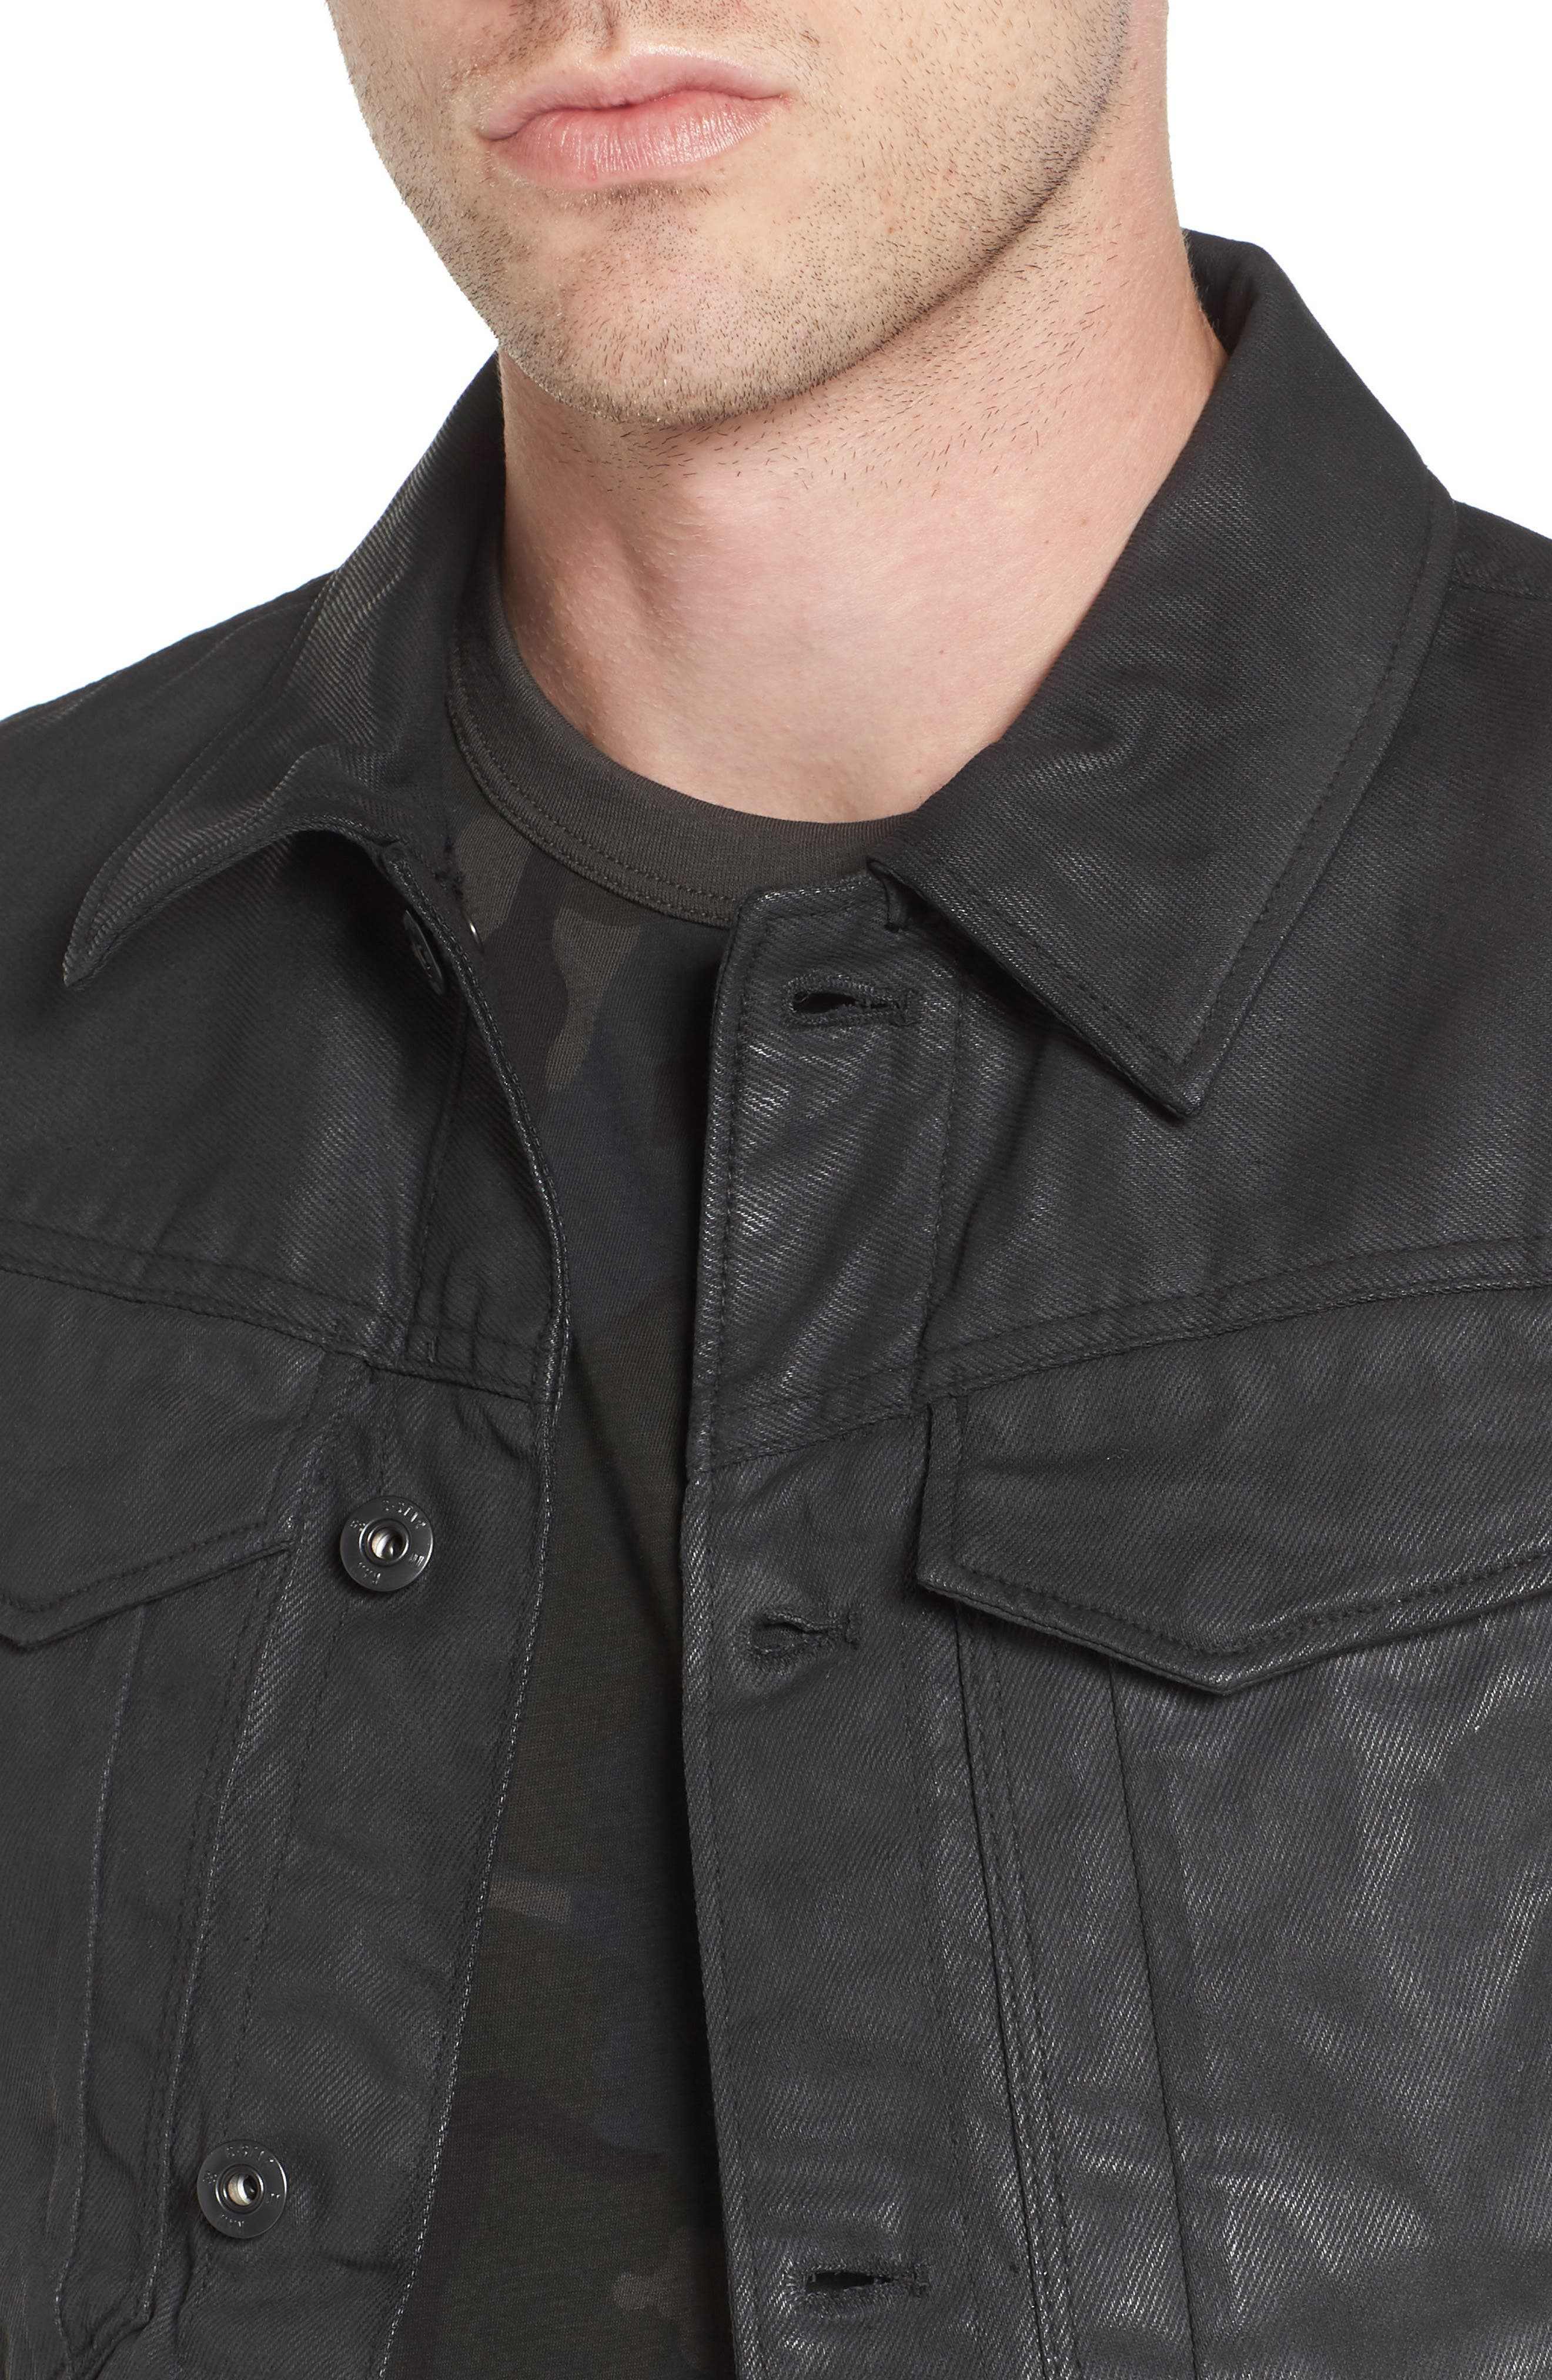 Motac 3D Slim Denim Jacket,                             Alternate thumbnail 4, color,                             001